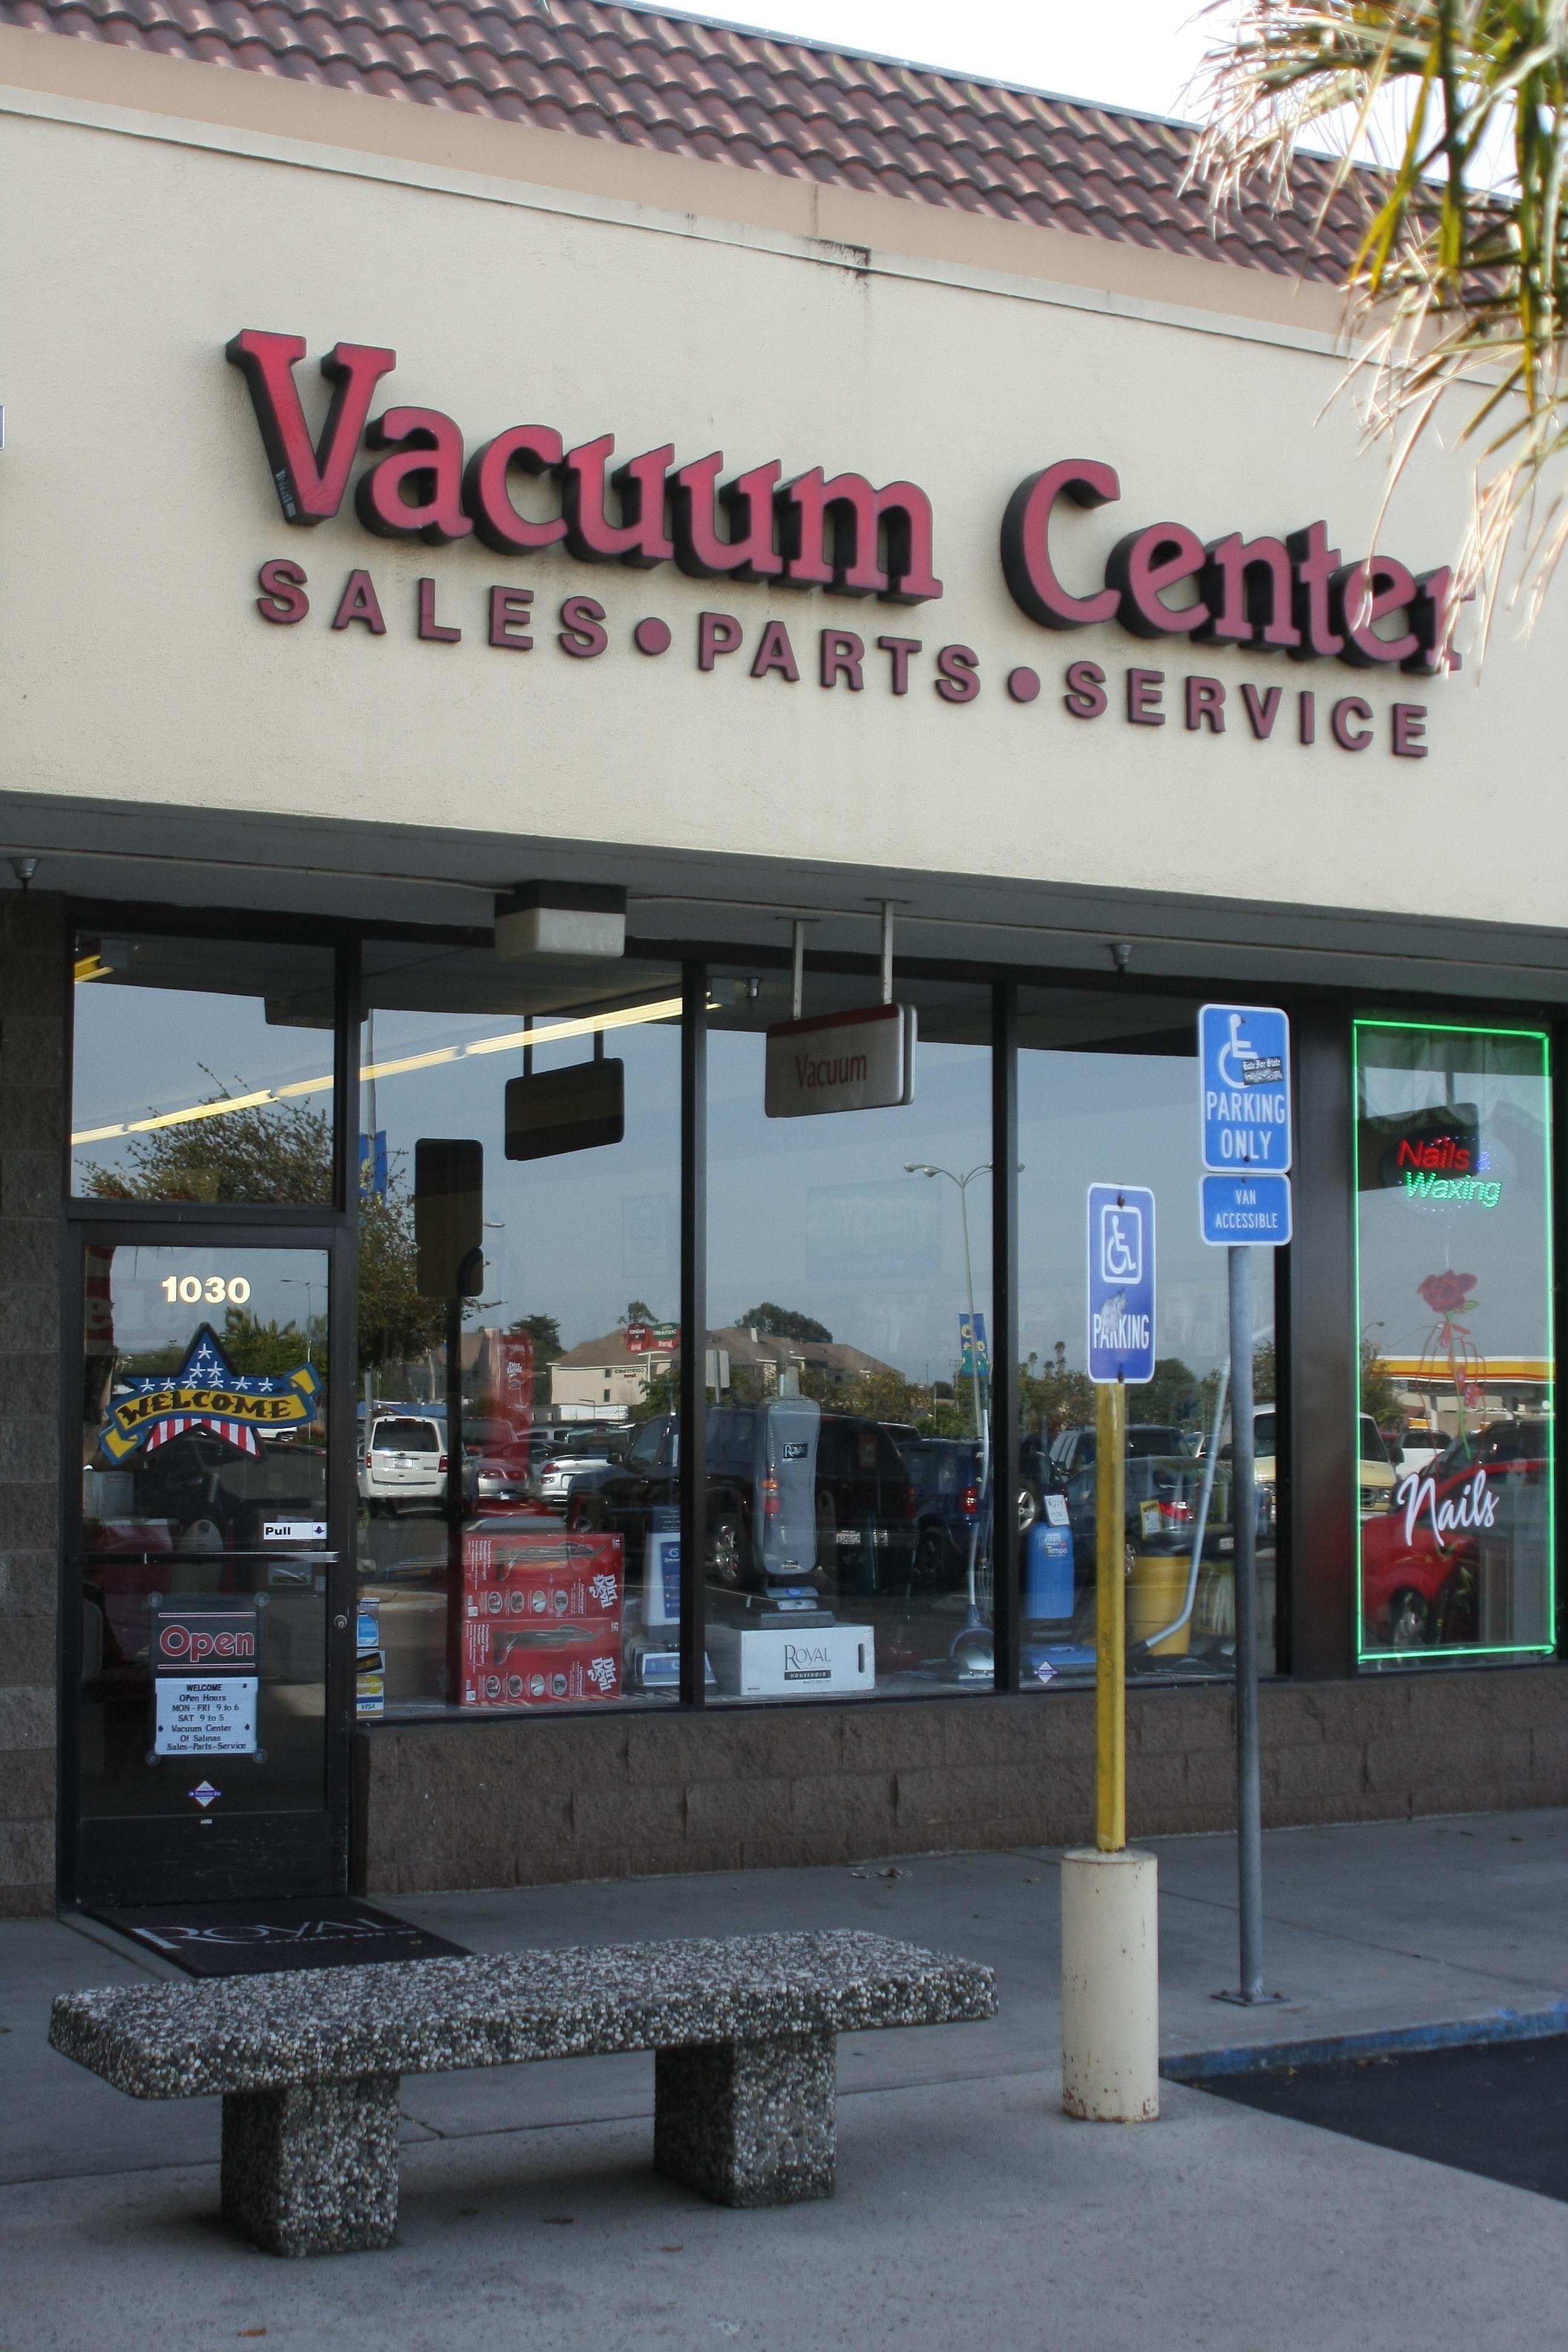 Vacuum Center Of Salinas image 0